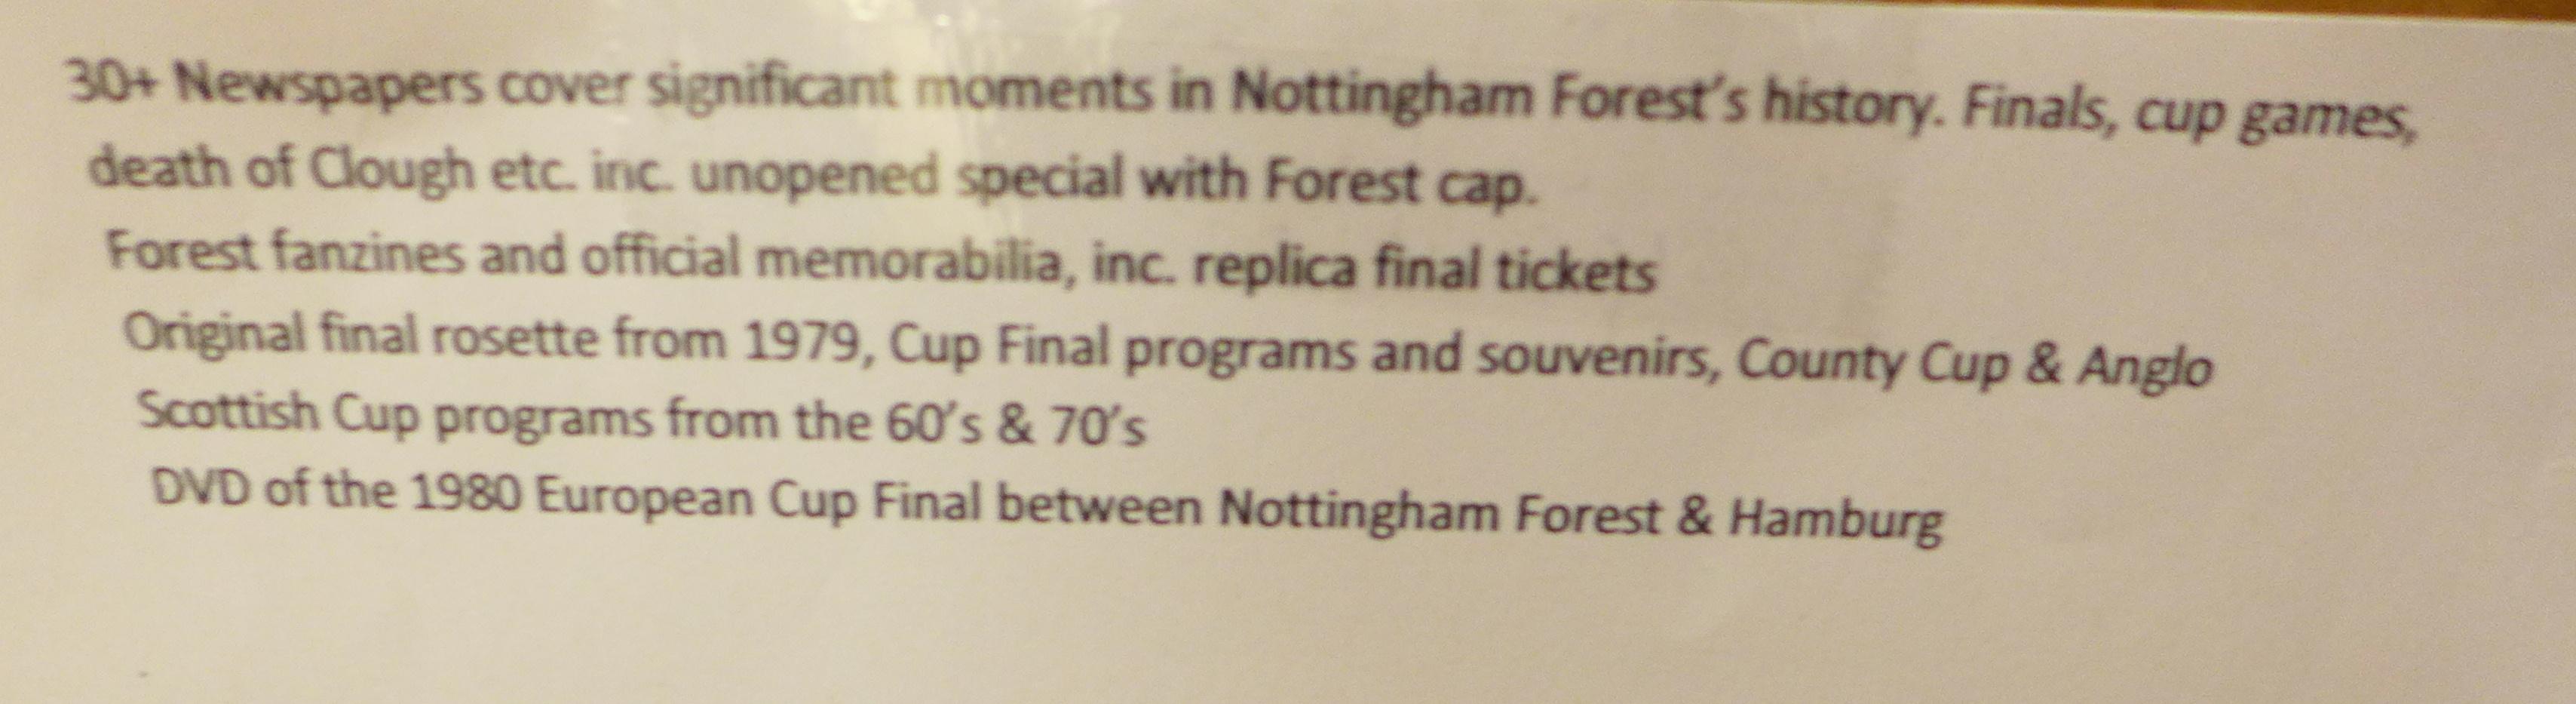 Football programmes including Nottingham Forest and other Nottingham Forest ephemera - Image 5 of 5